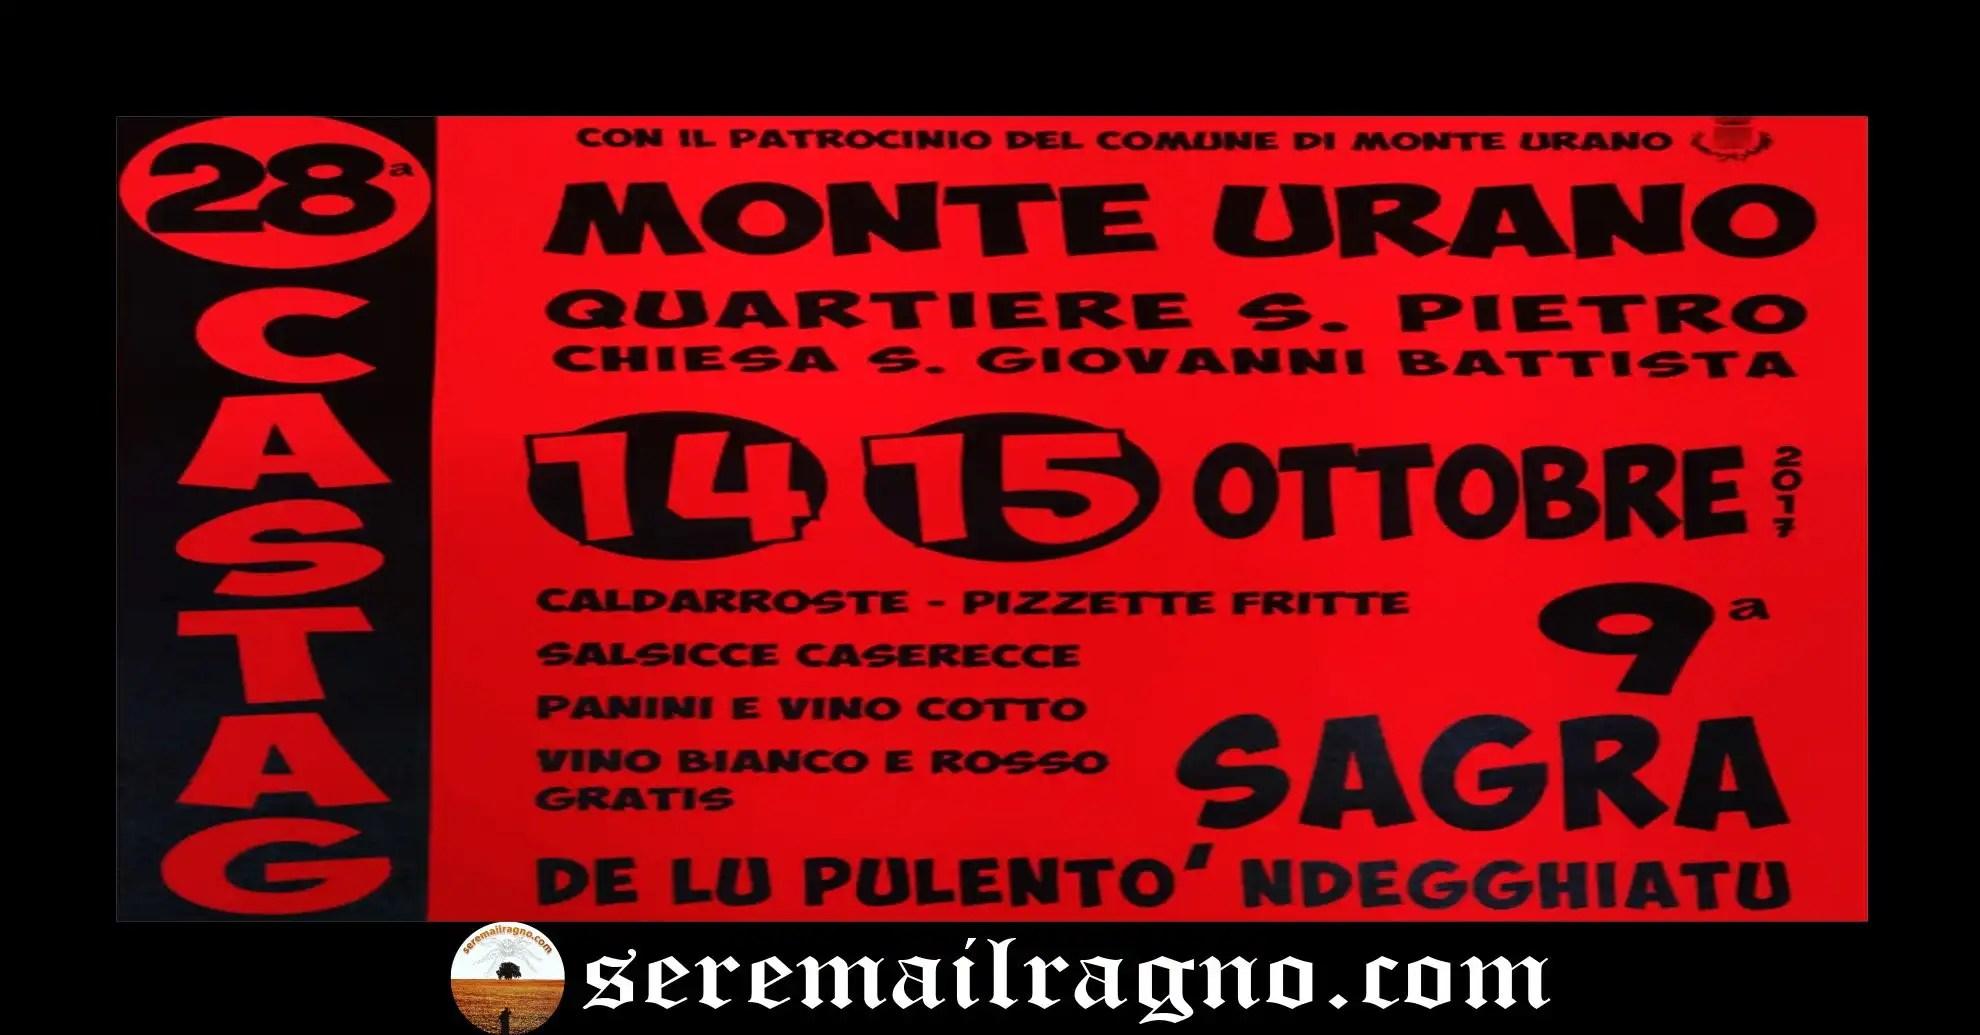 Monte Urano: 28° Castagnata e 9° Sagra de lu pulentò ndegghiatu